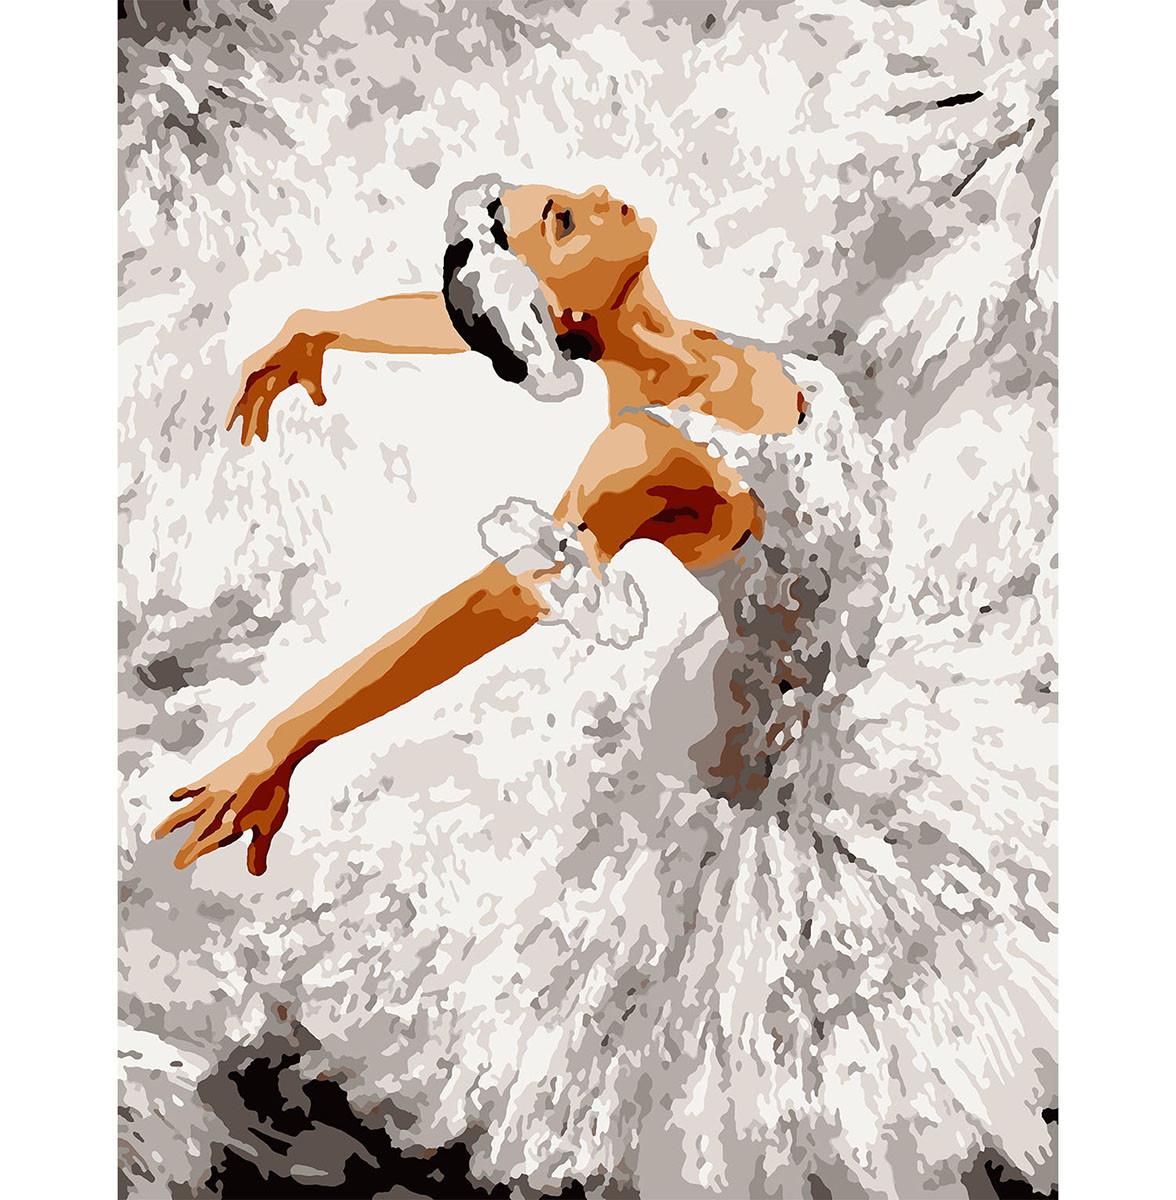 Картина по номерам в подарочной коробке Грация танца 40*50 см. Santi код:953906